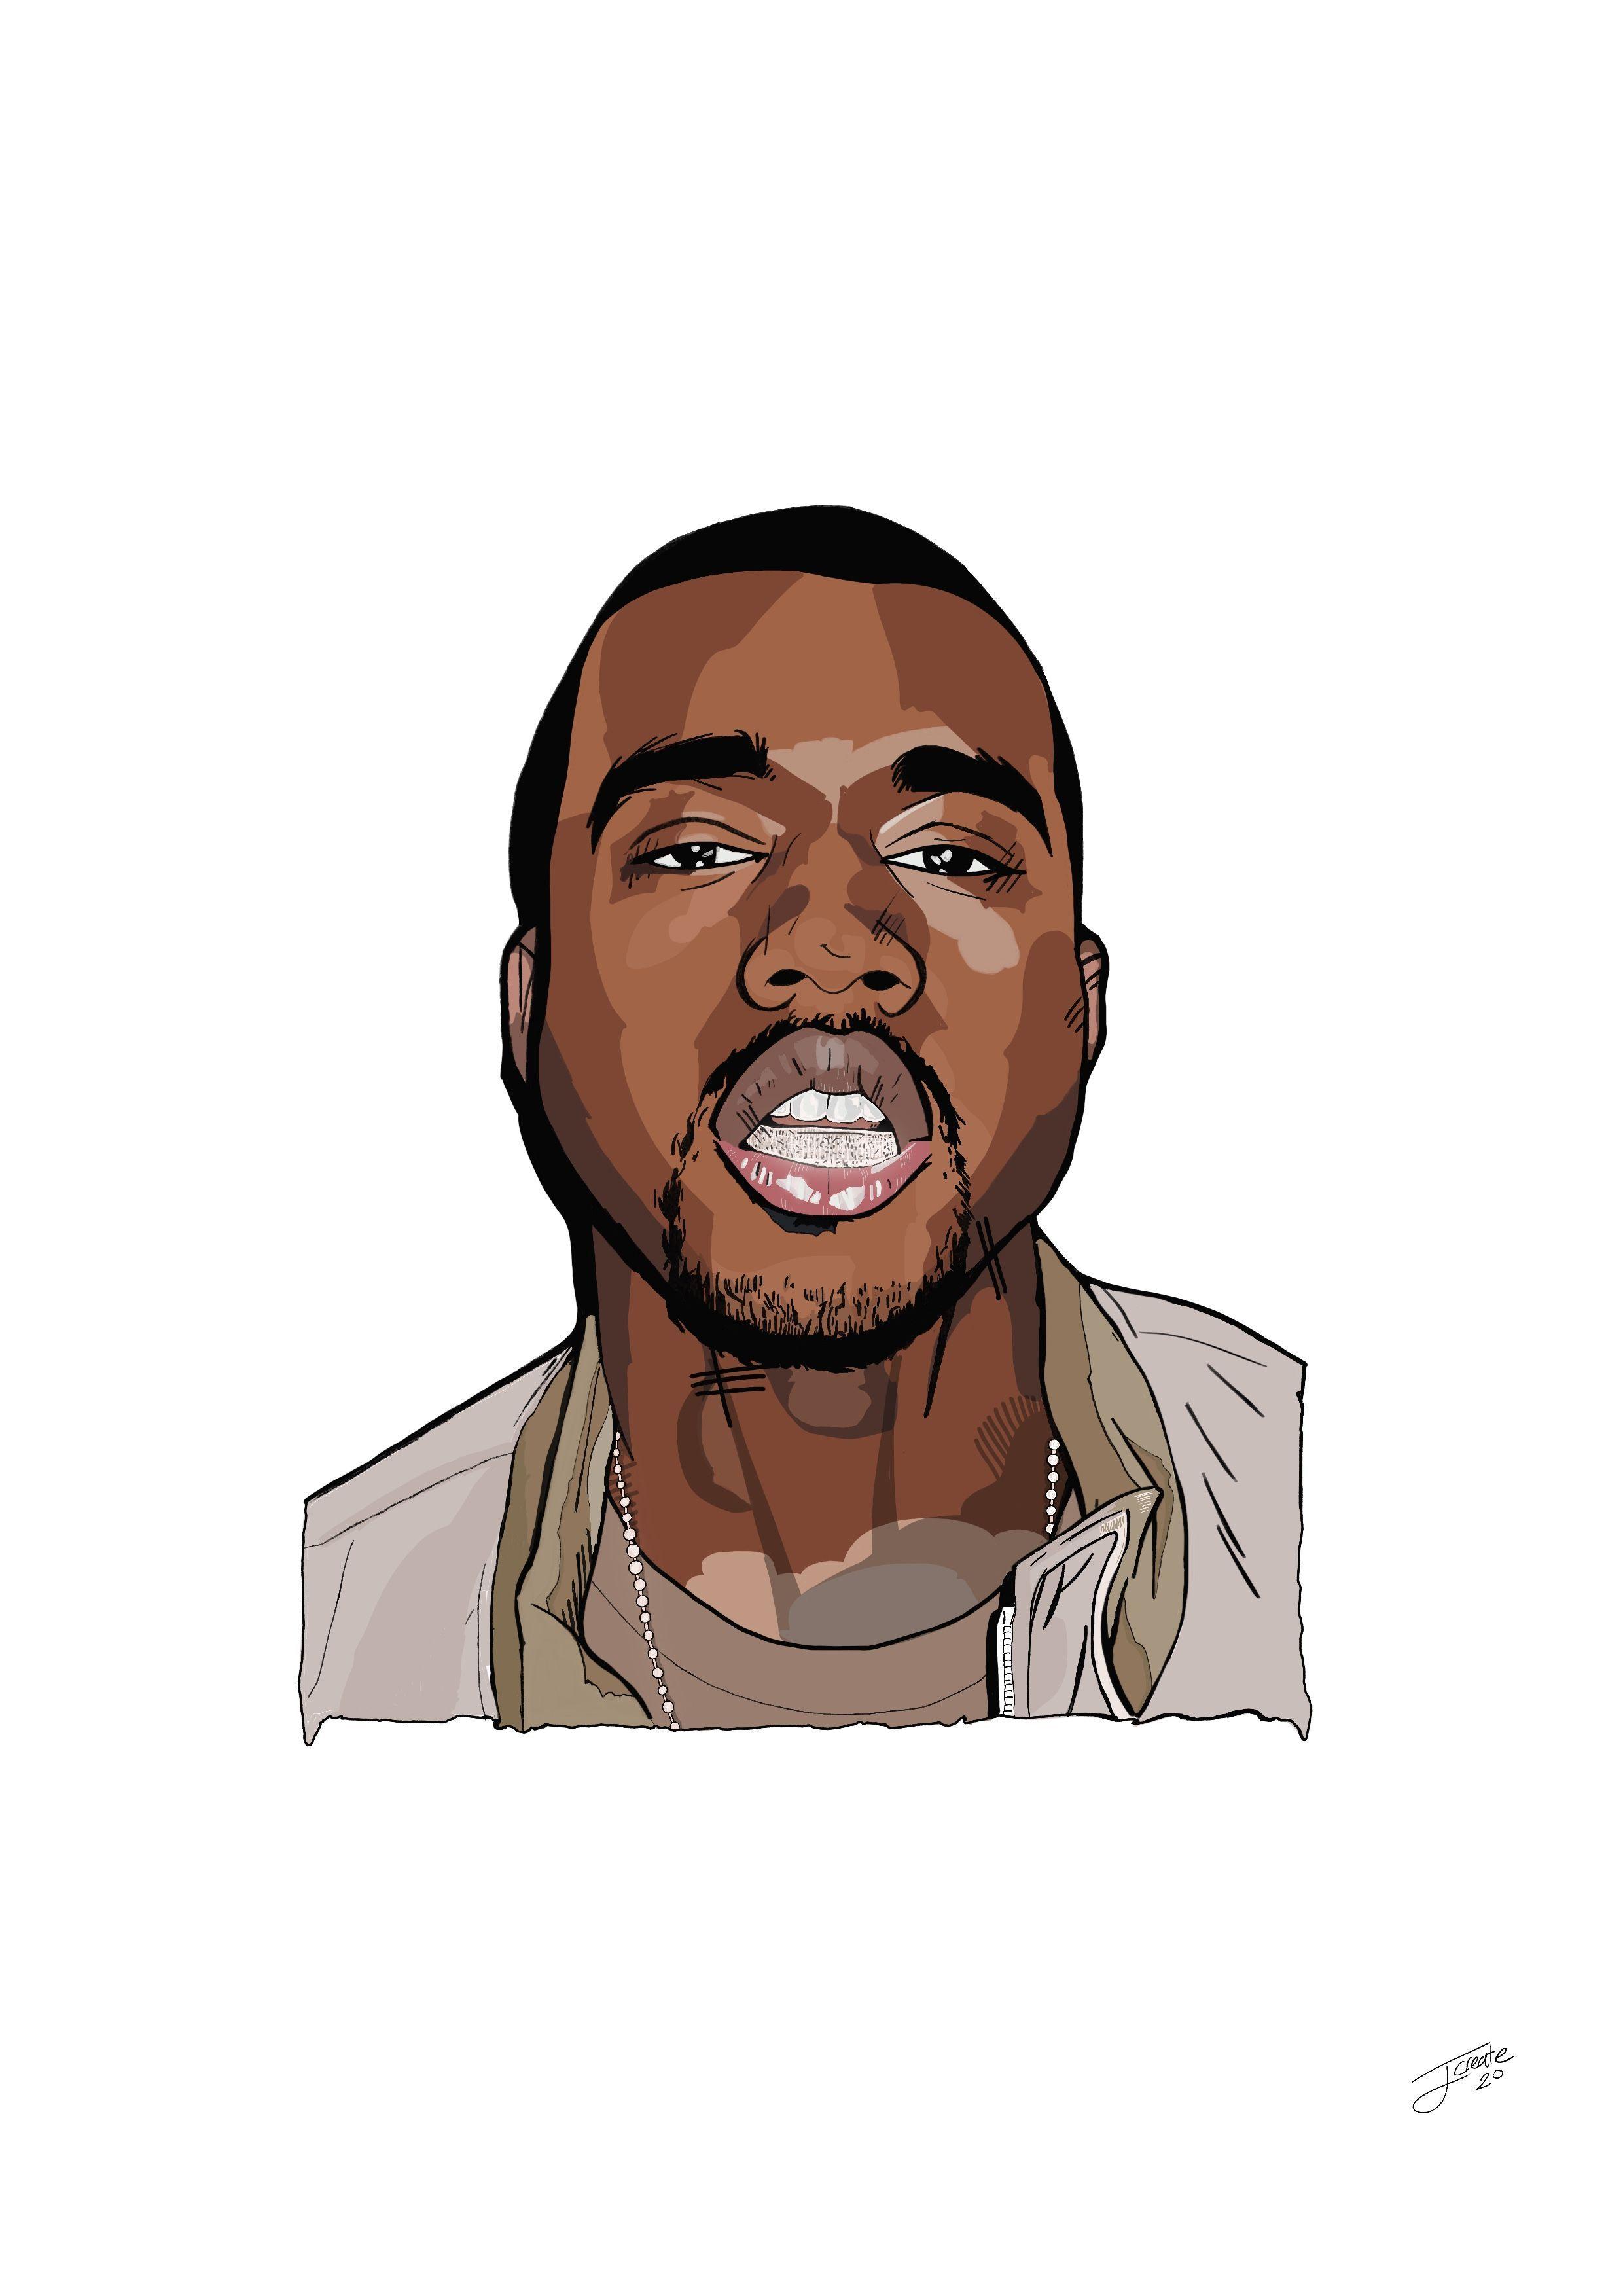 Kanye West Portrait In 2020 Ipad Pro Art Digital Art Illustration Digital Art